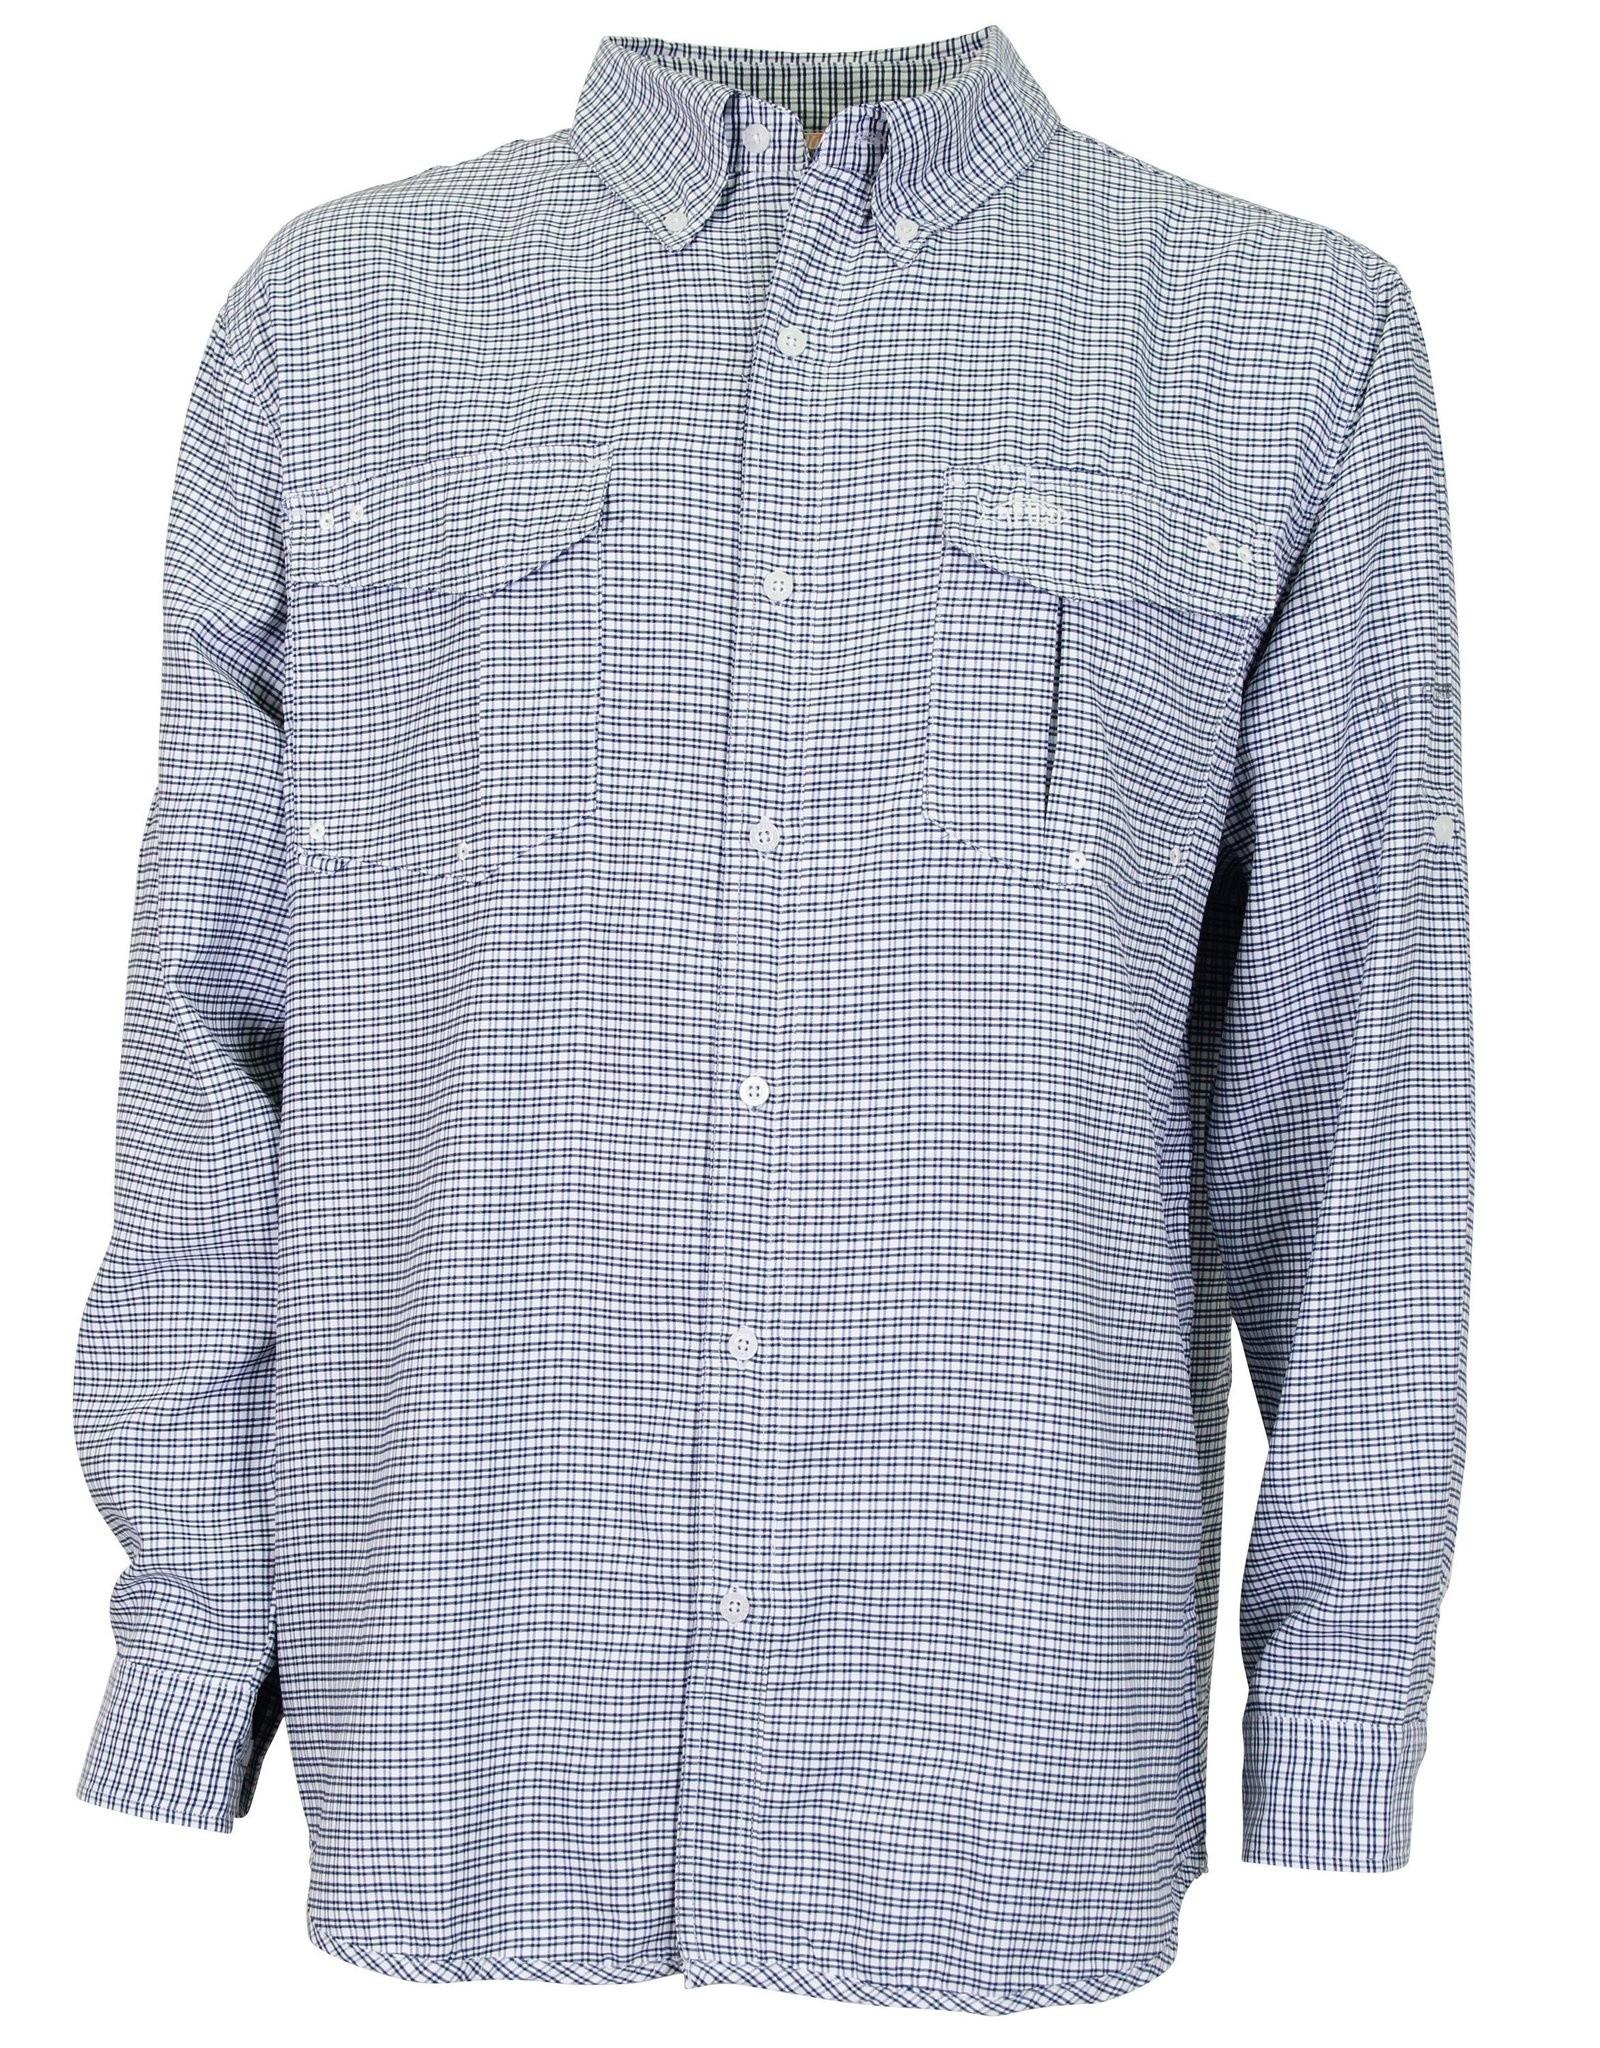 Aftco Sirius Fishing Button Down Shirt